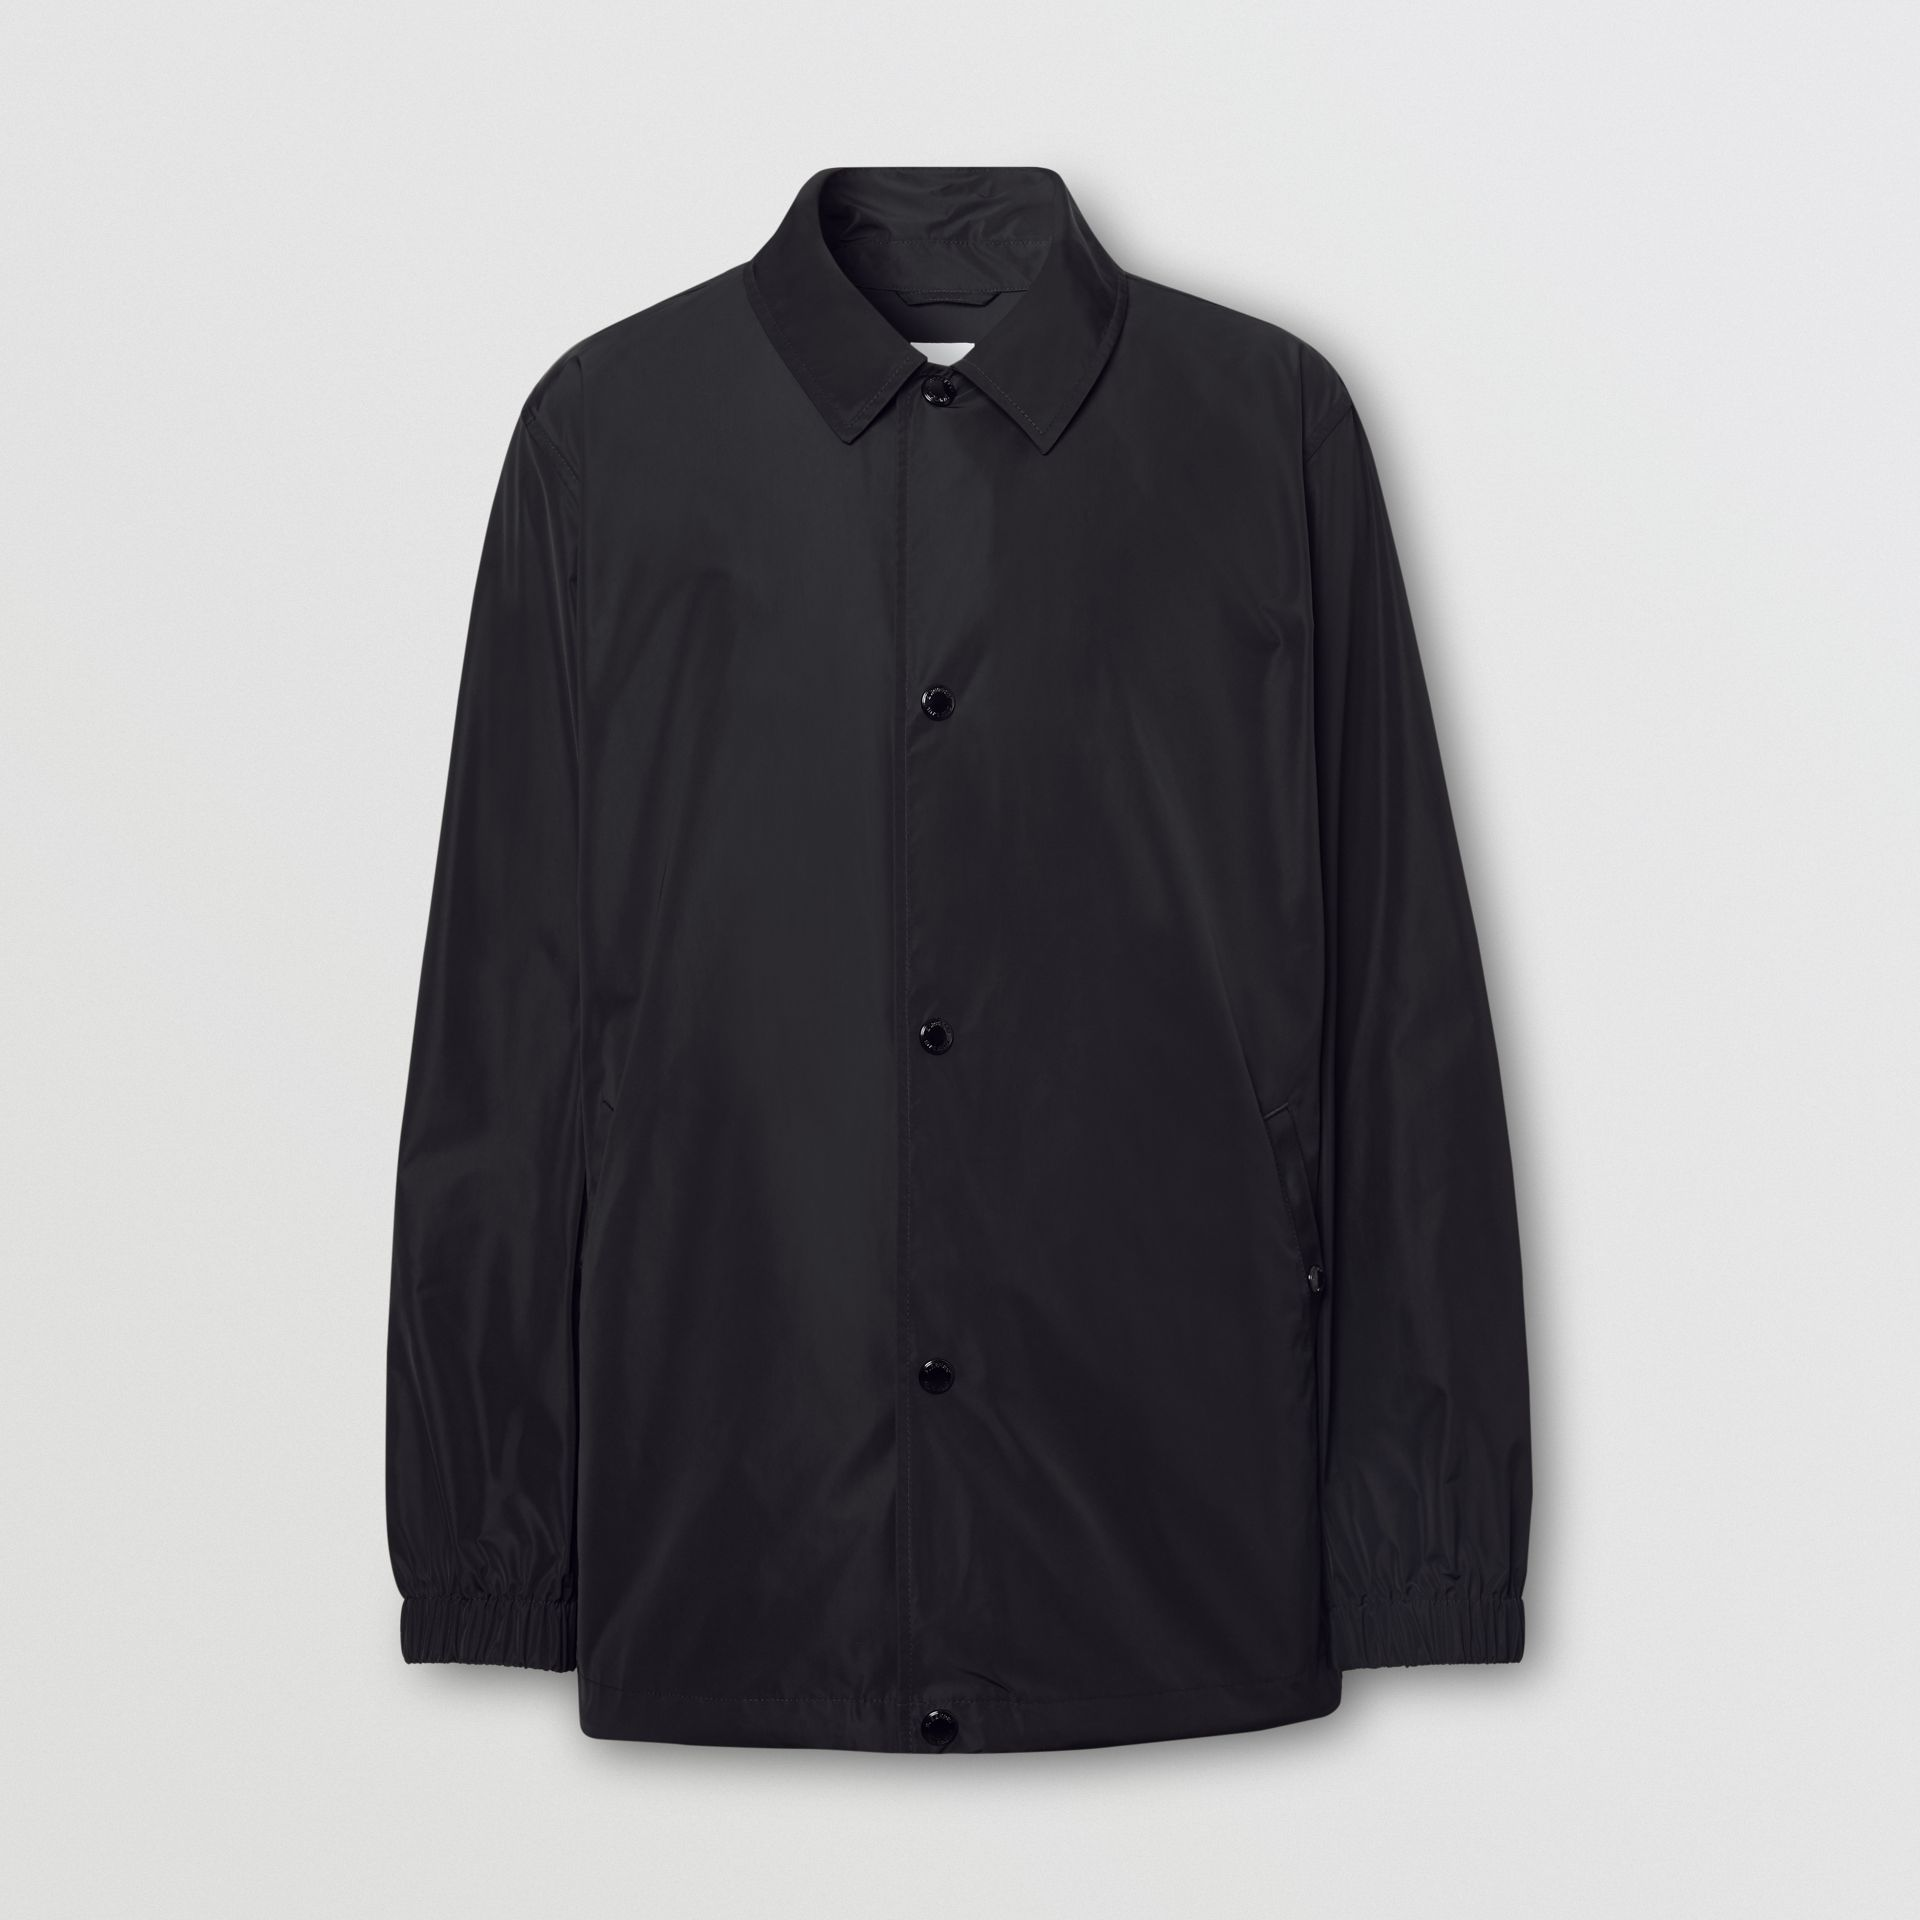 Tape Print Shape-memory Taffeta Jacket in Black - Men | Burberry Hong Kong S.A.R - gallery image 3